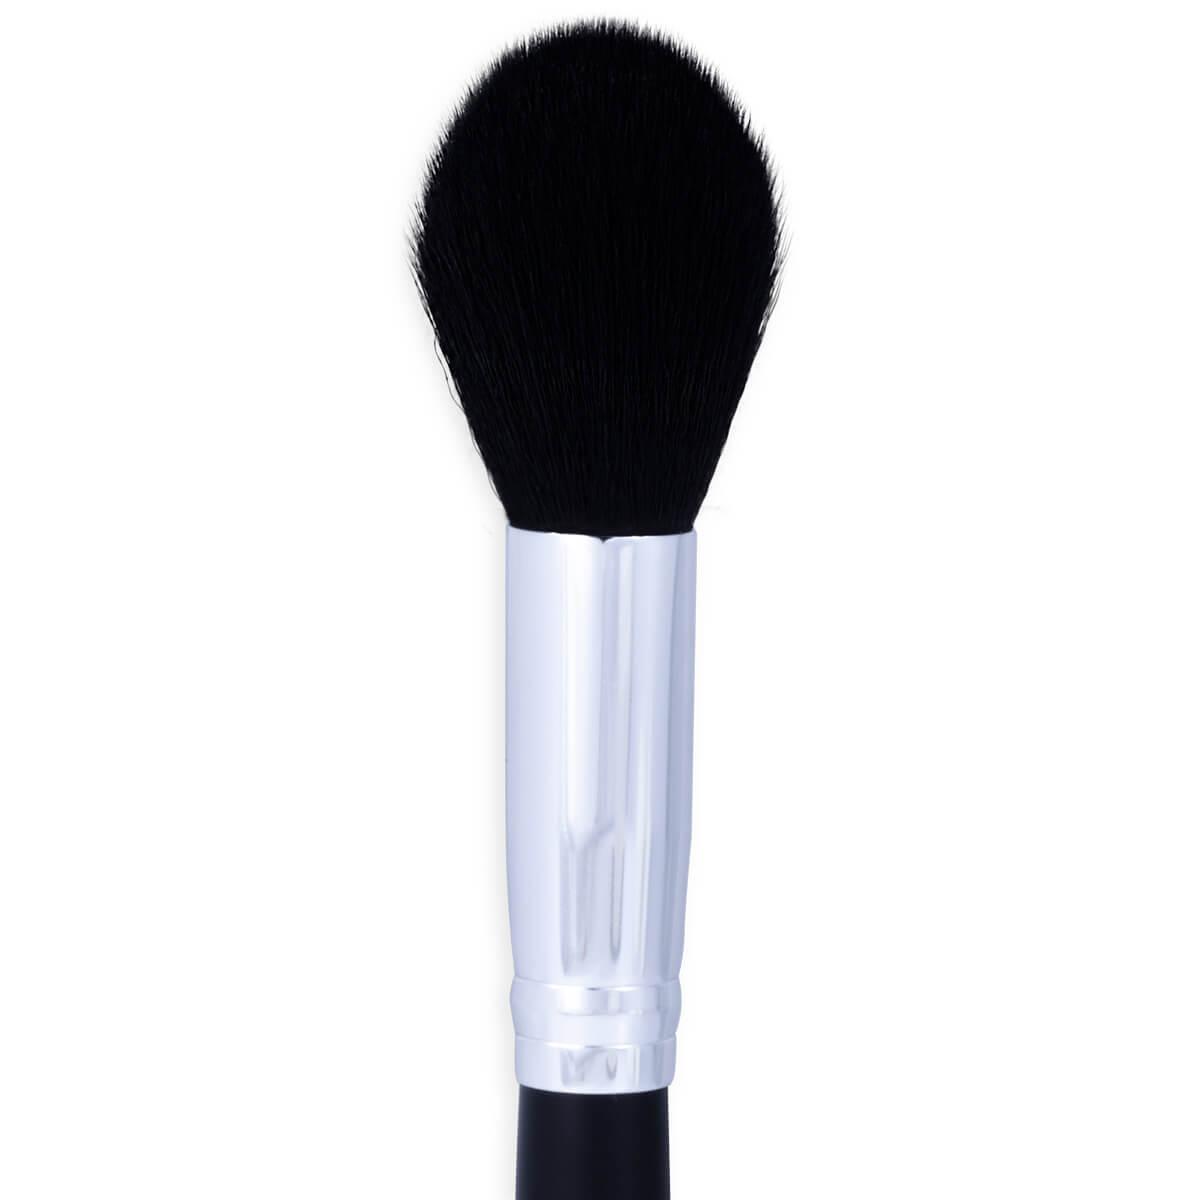 S171 - Pincel Para Iluminador Sffumato Beauty